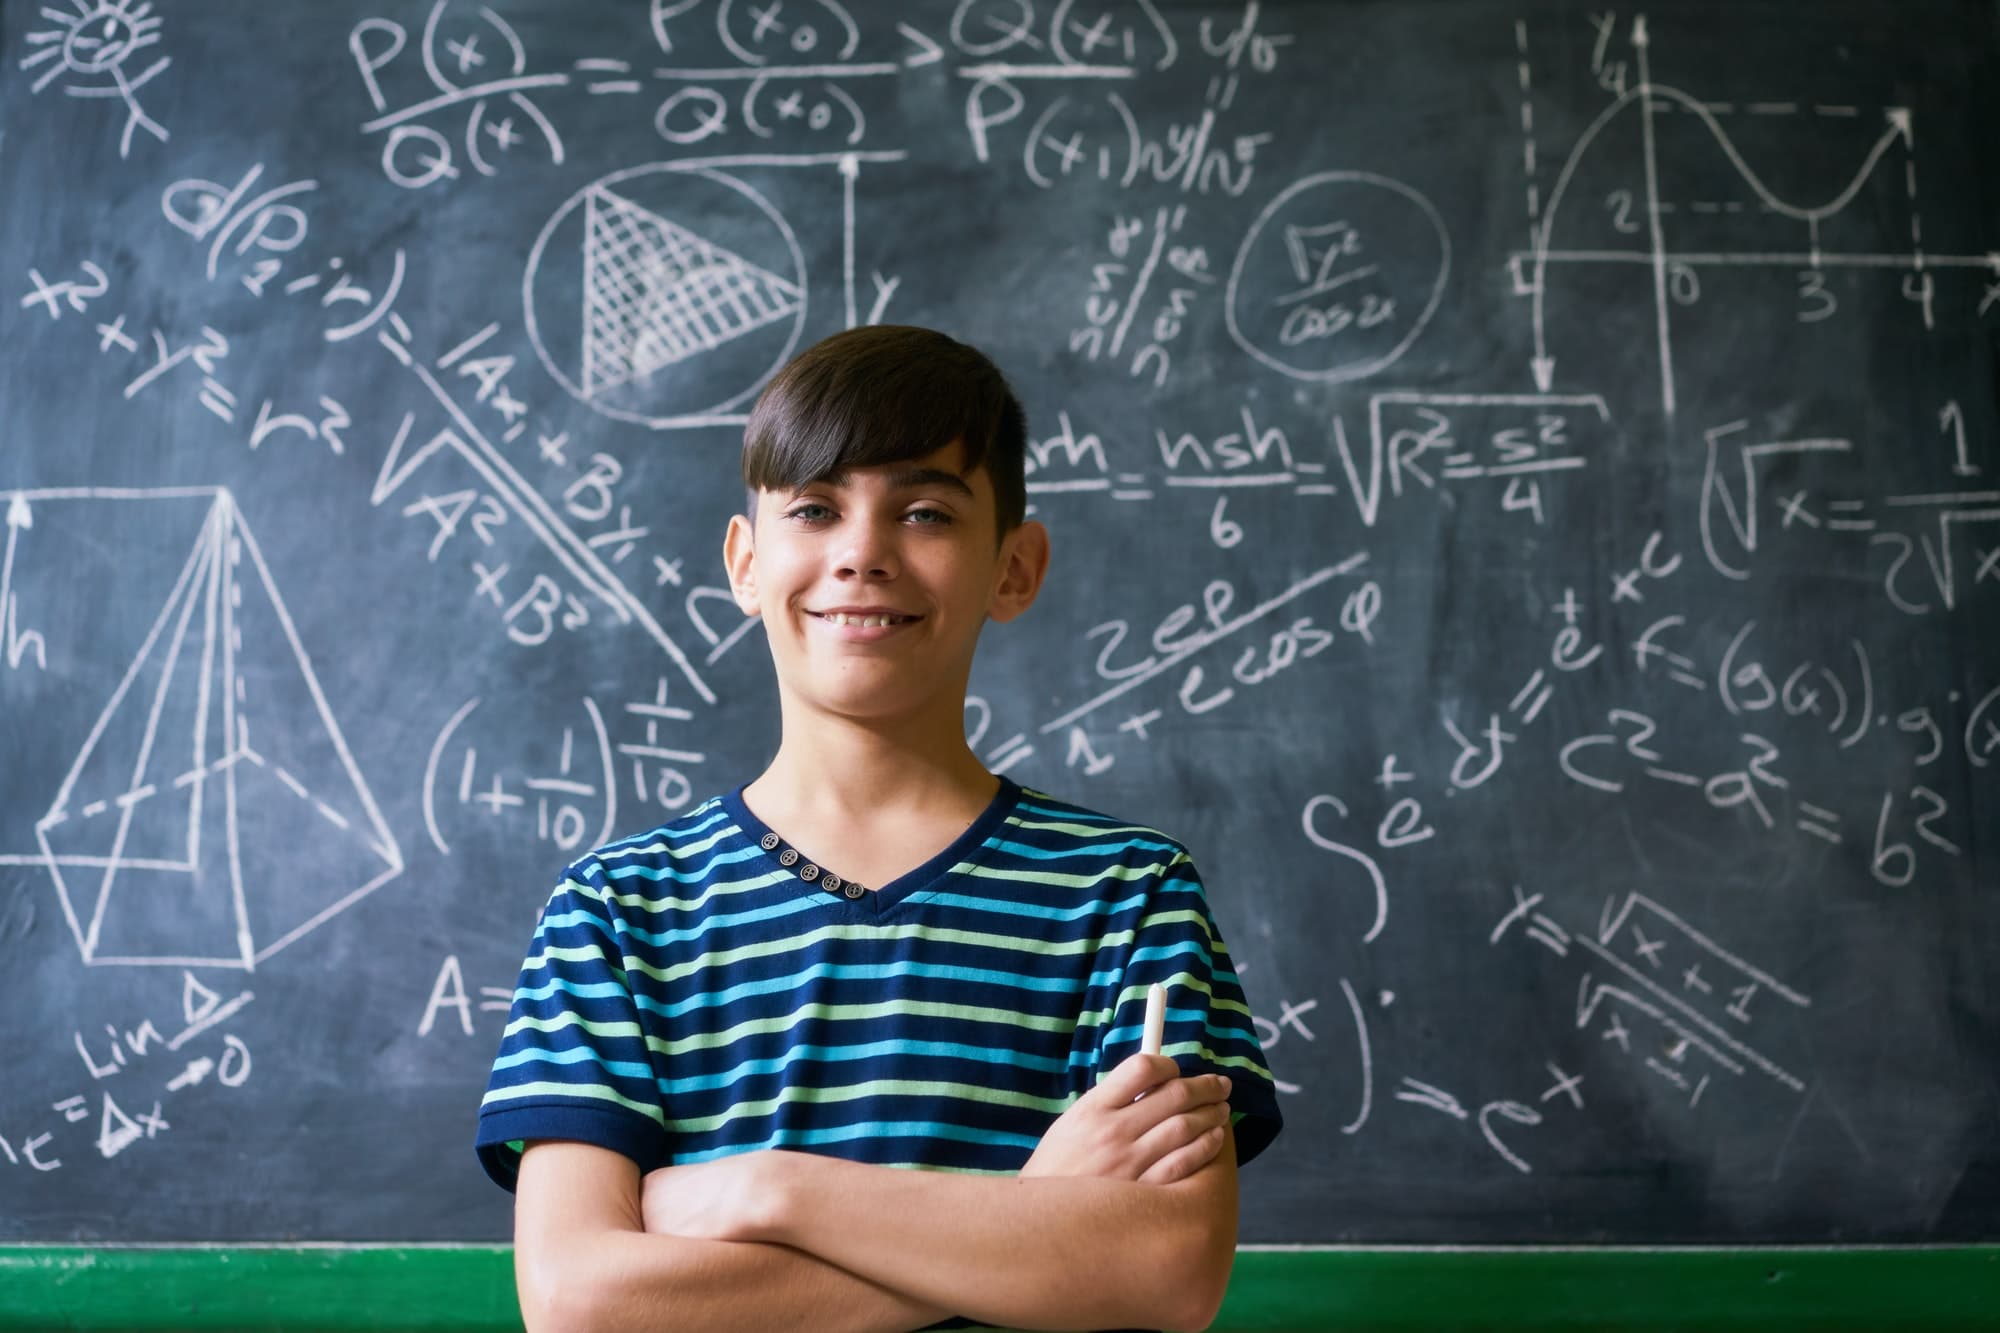 Boy Smiling At Camera During Math Lesson